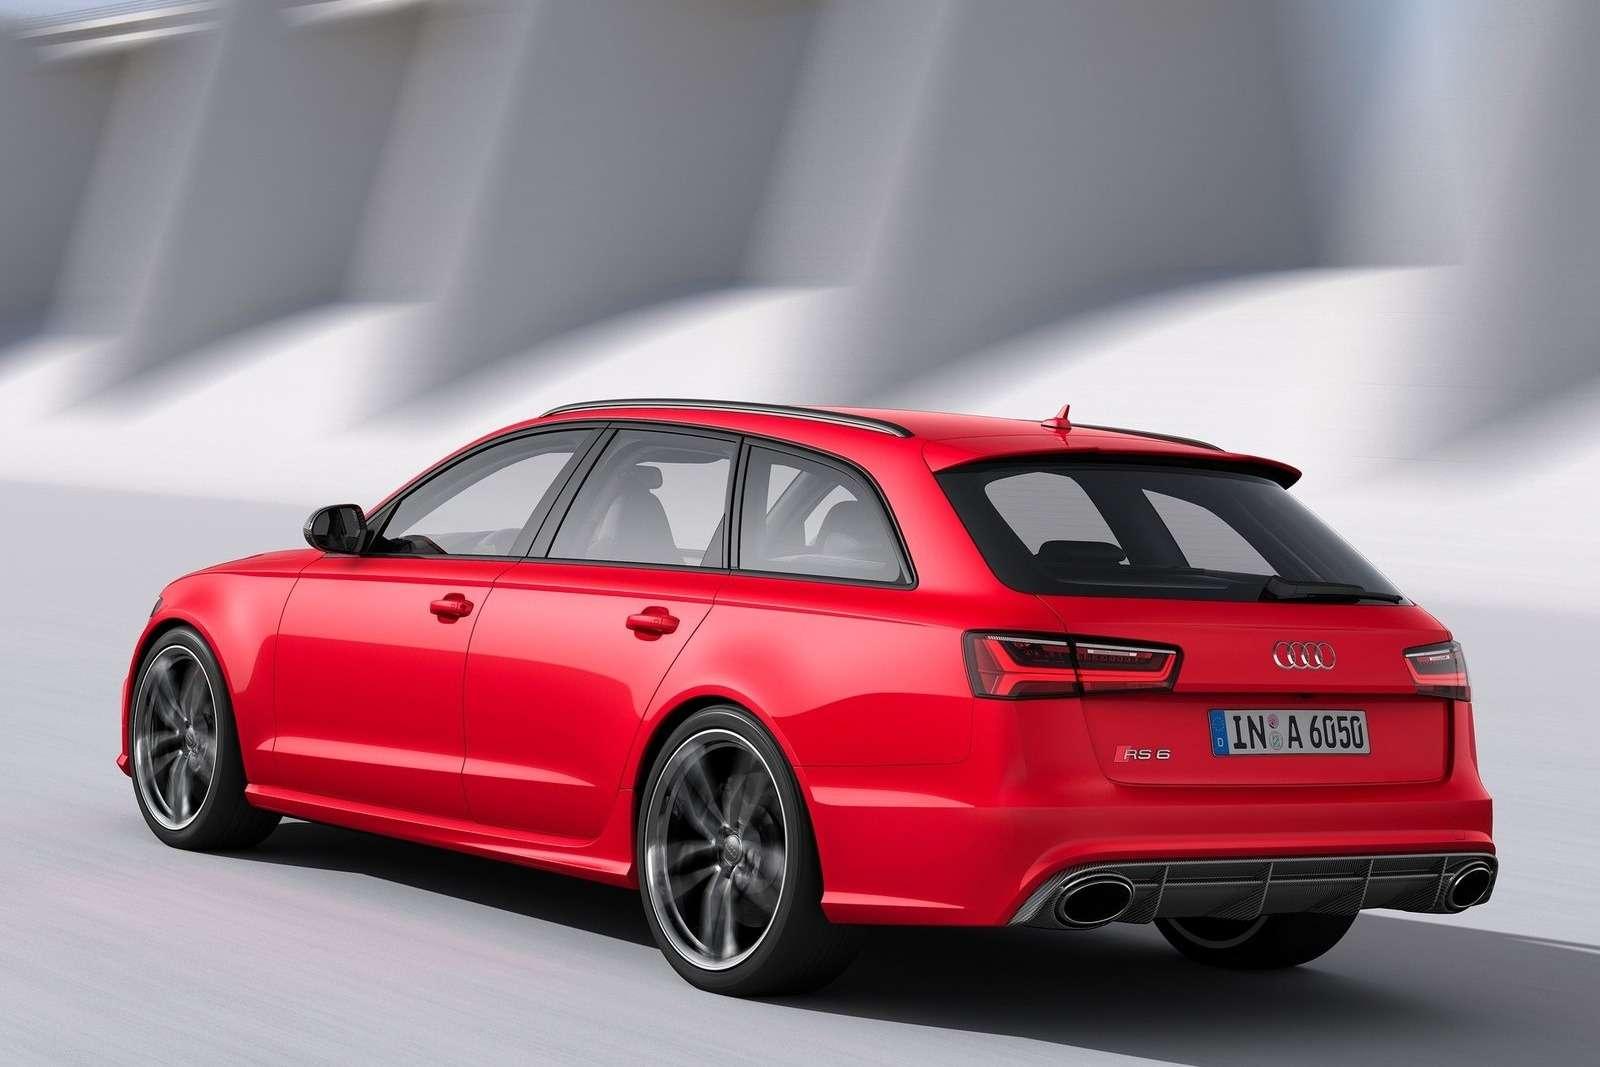 Audi-RS6_Avant_2015_1600x1200_wallpaper_05